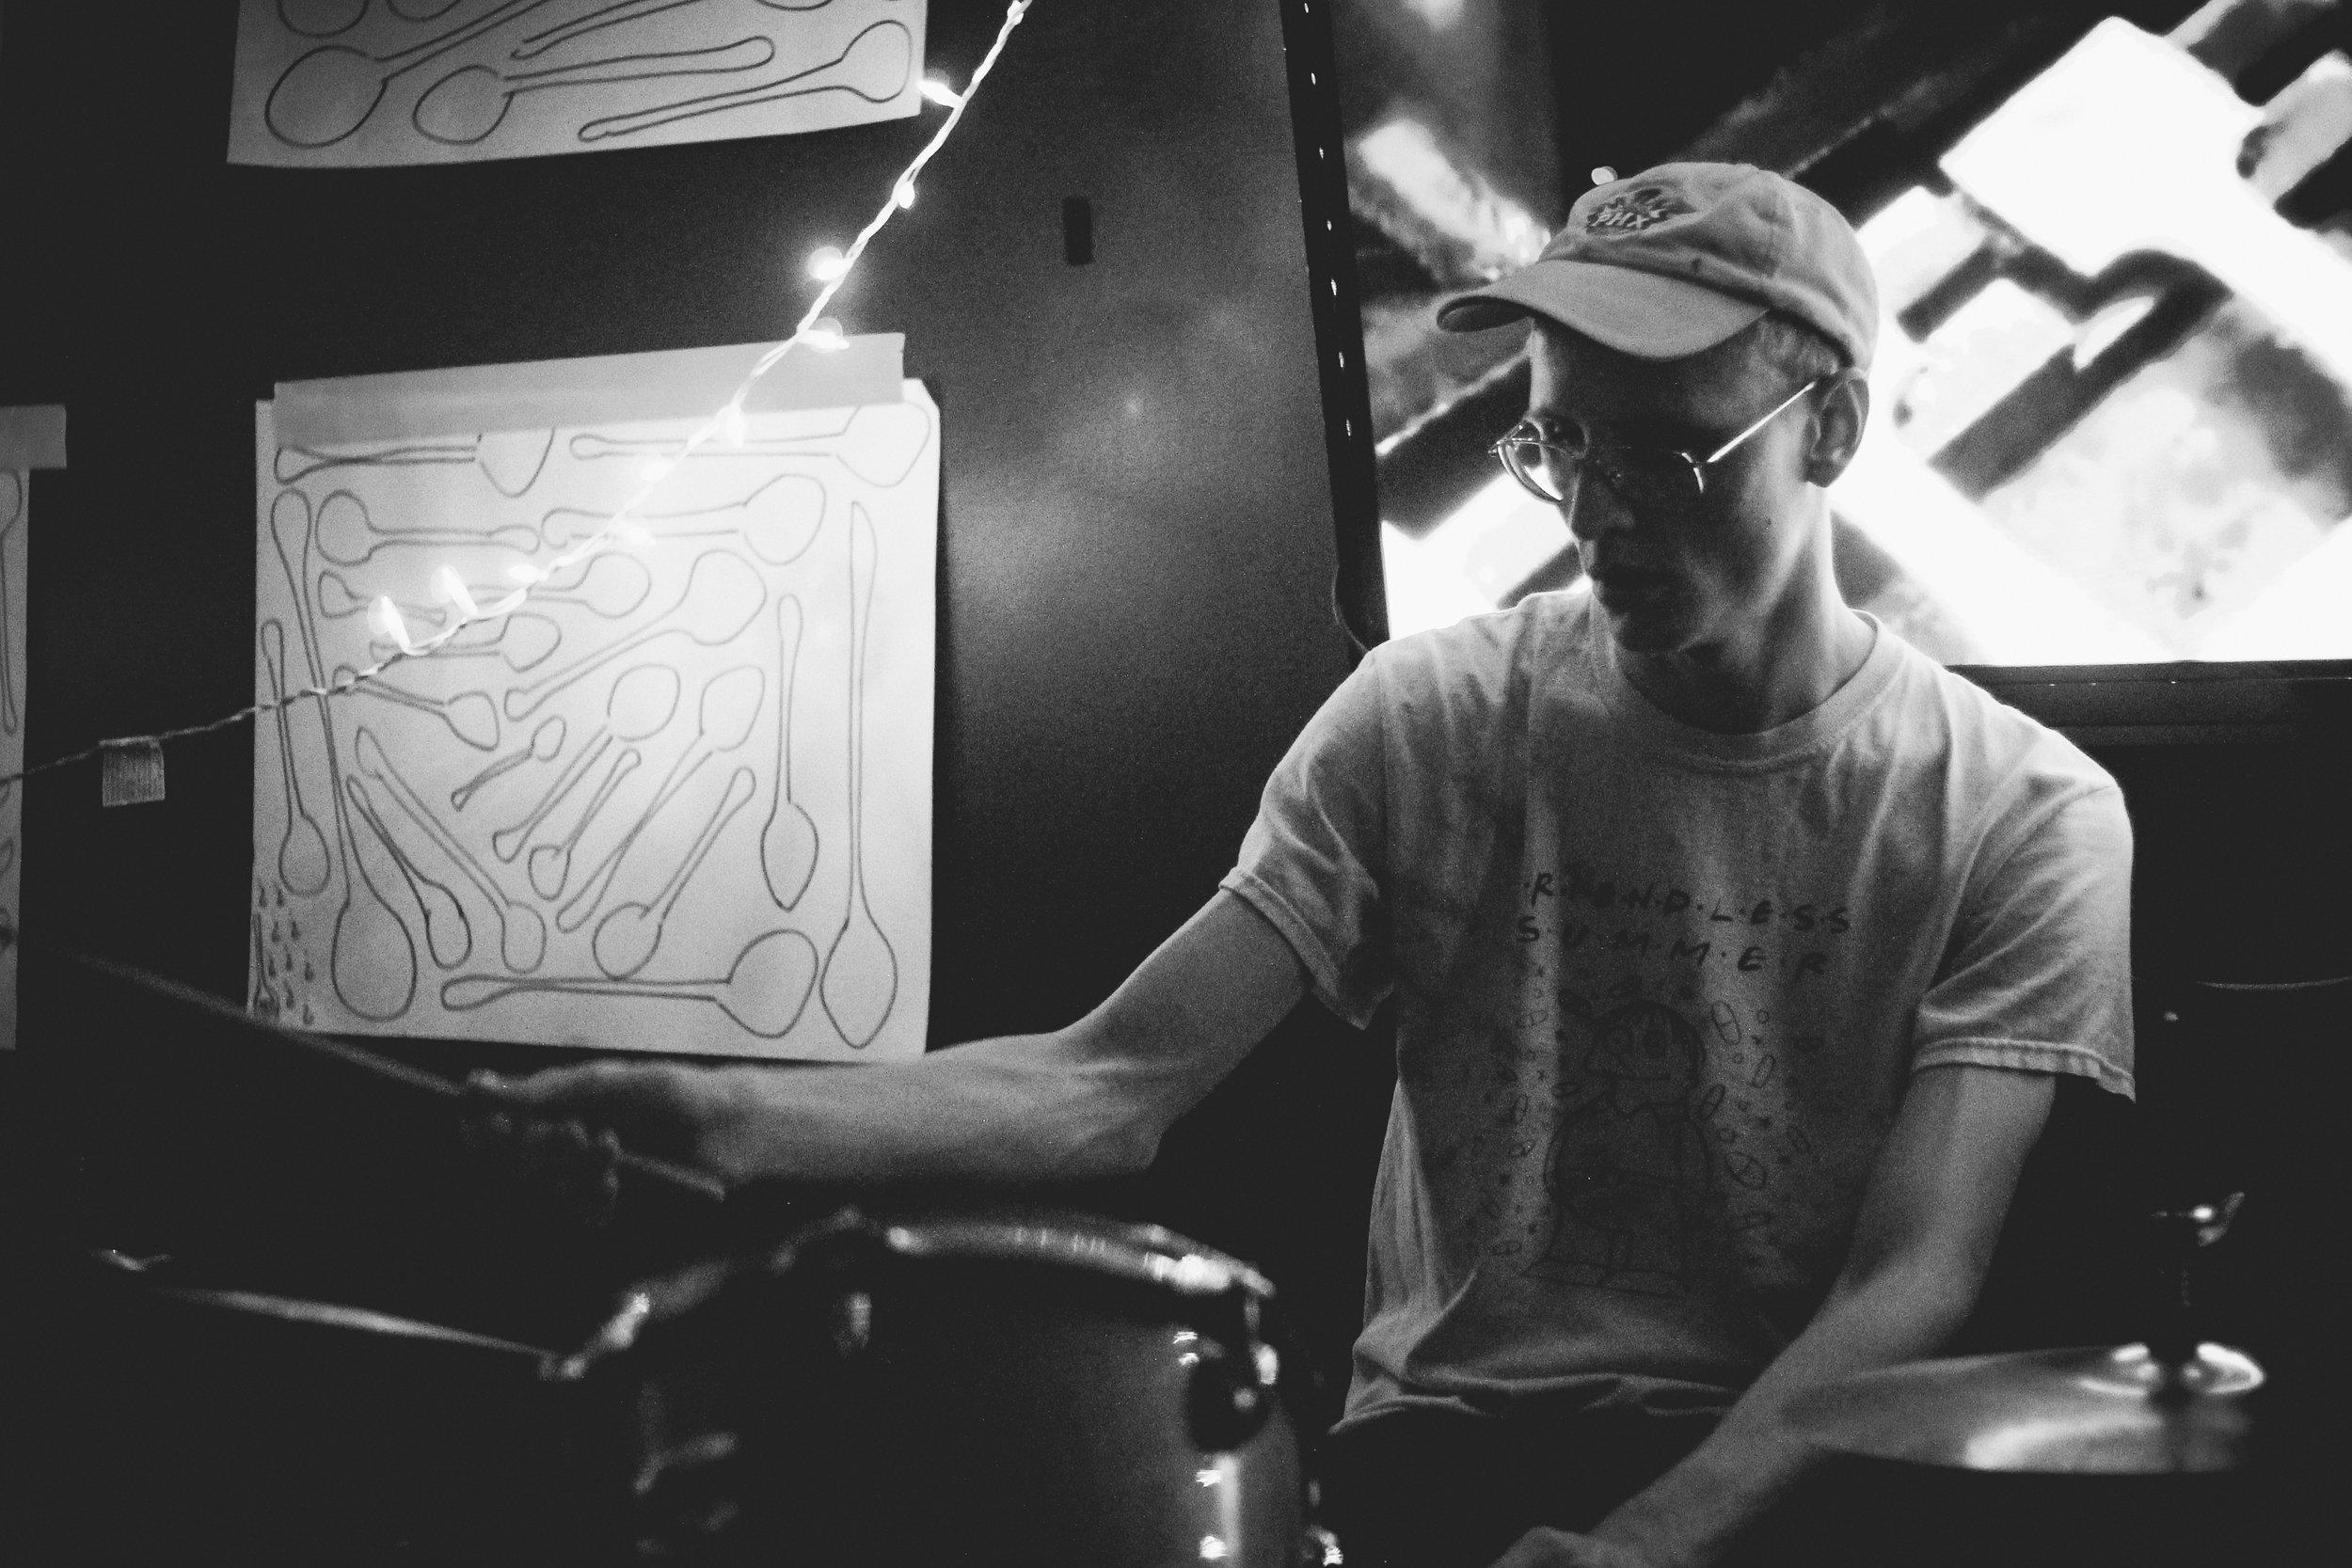 Pro Teens drummer Matt Tanner with Spoon Art